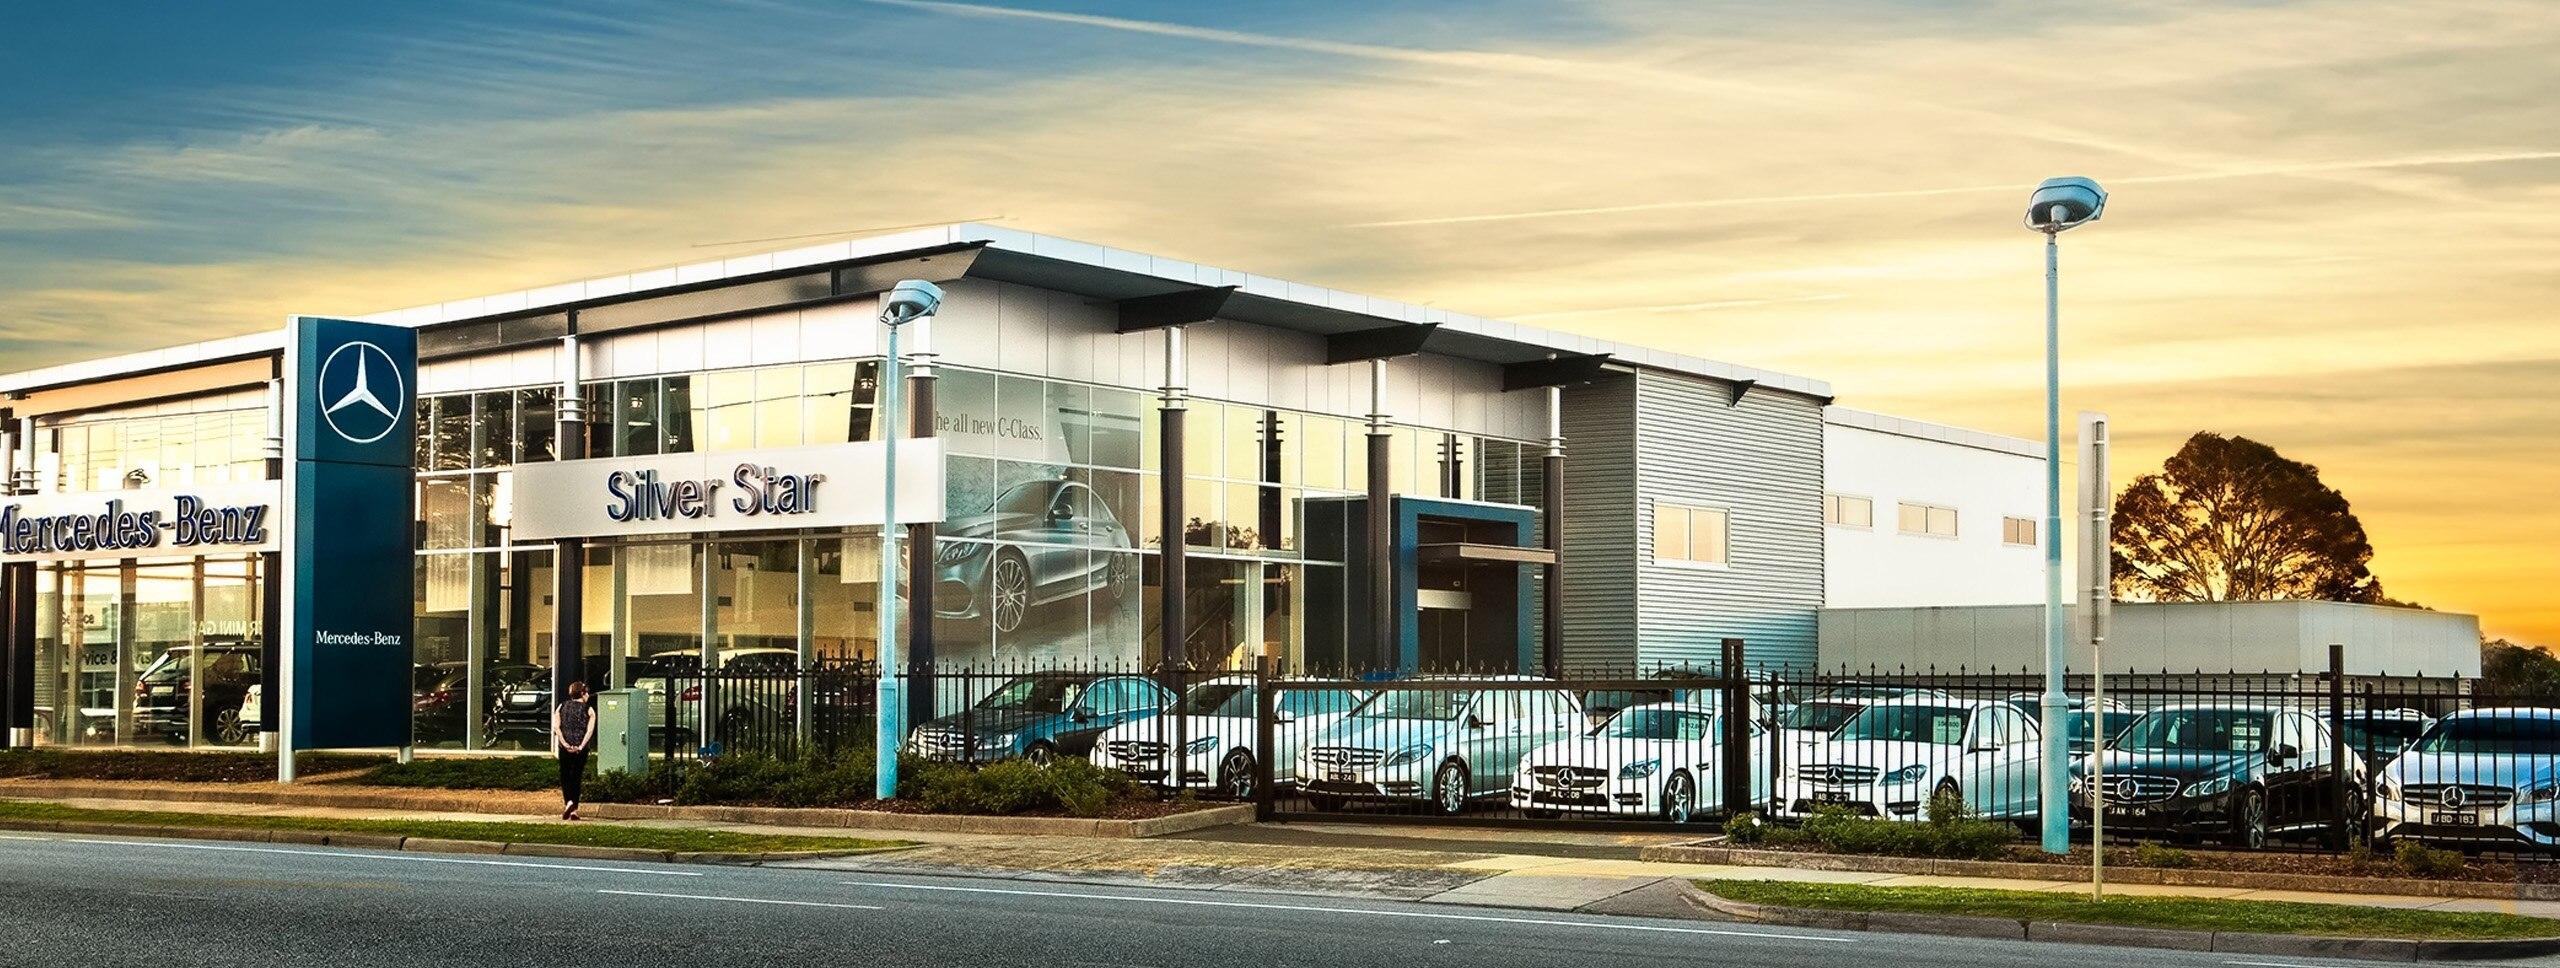 Silver Star Motors Pre-Owned Sales